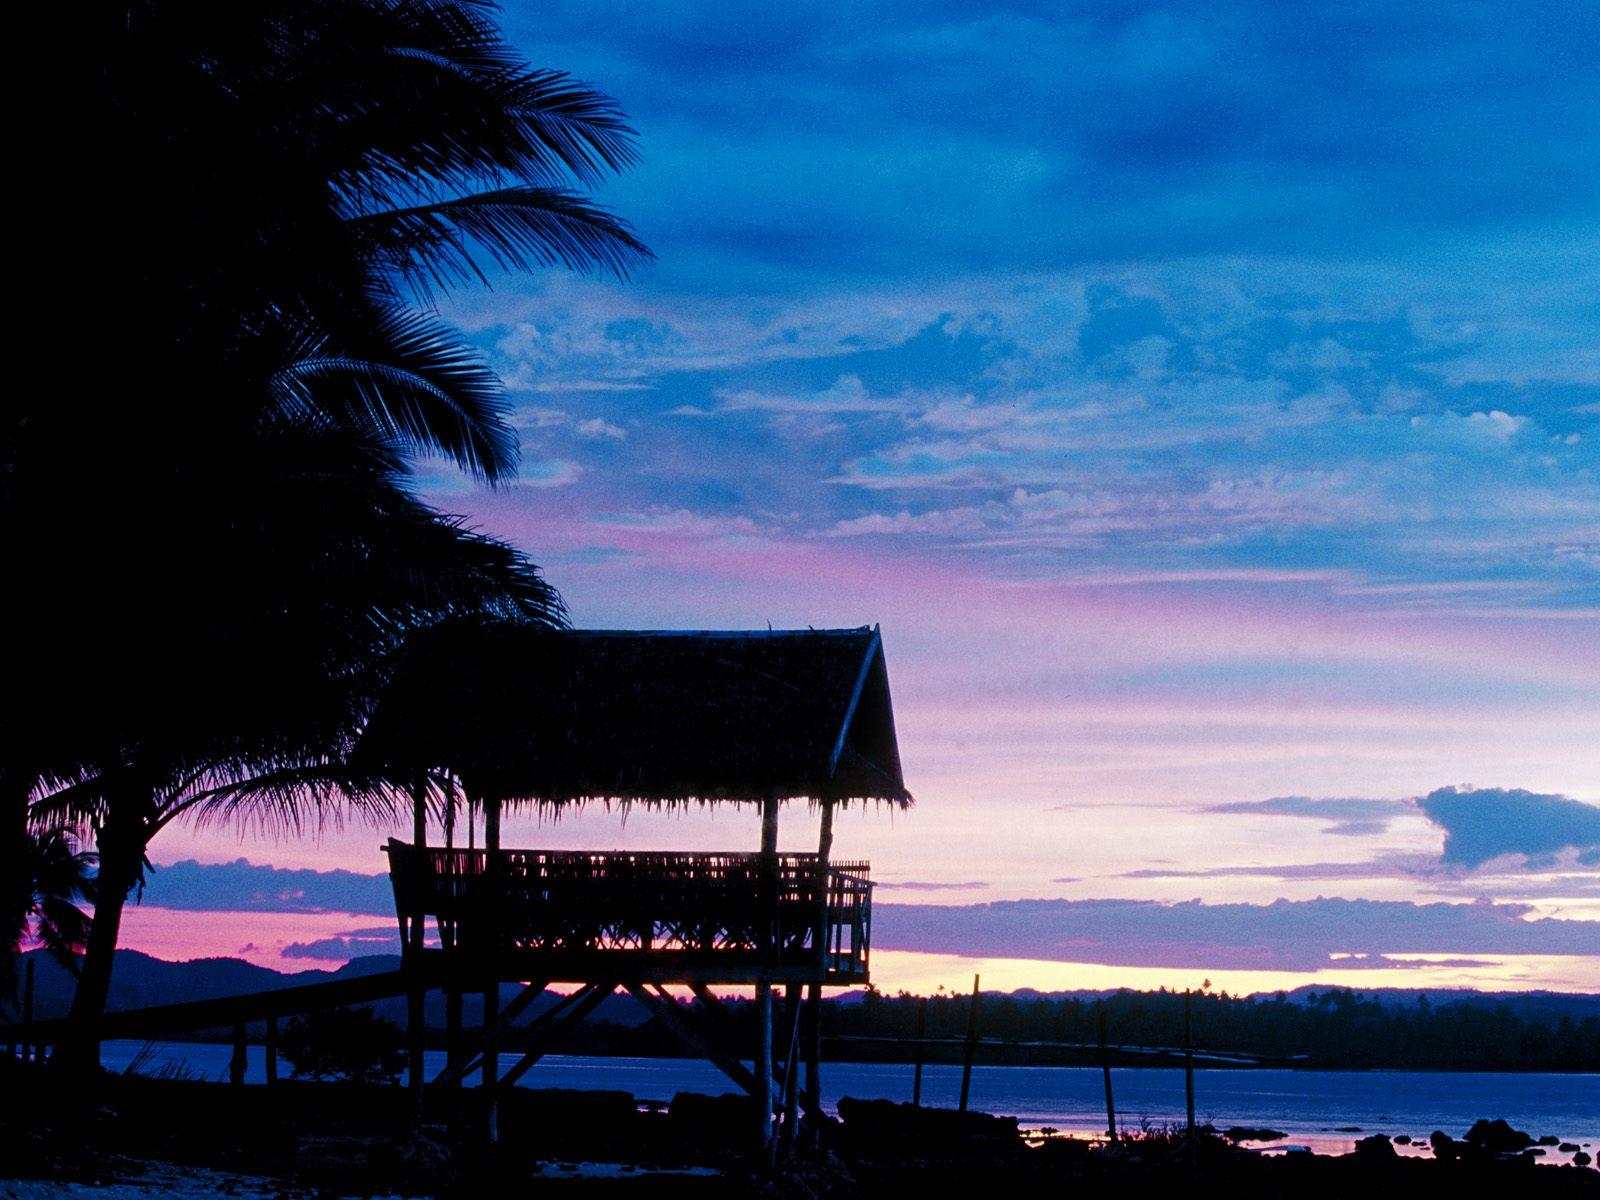 http://3.bp.blogspot.com/-KquVE_PzxnM/ThMrp3Wa9fI/AAAAAAAAAFw/h-zh1T1AzJo/s1600/beach31-scenery-wallpapers.jpg